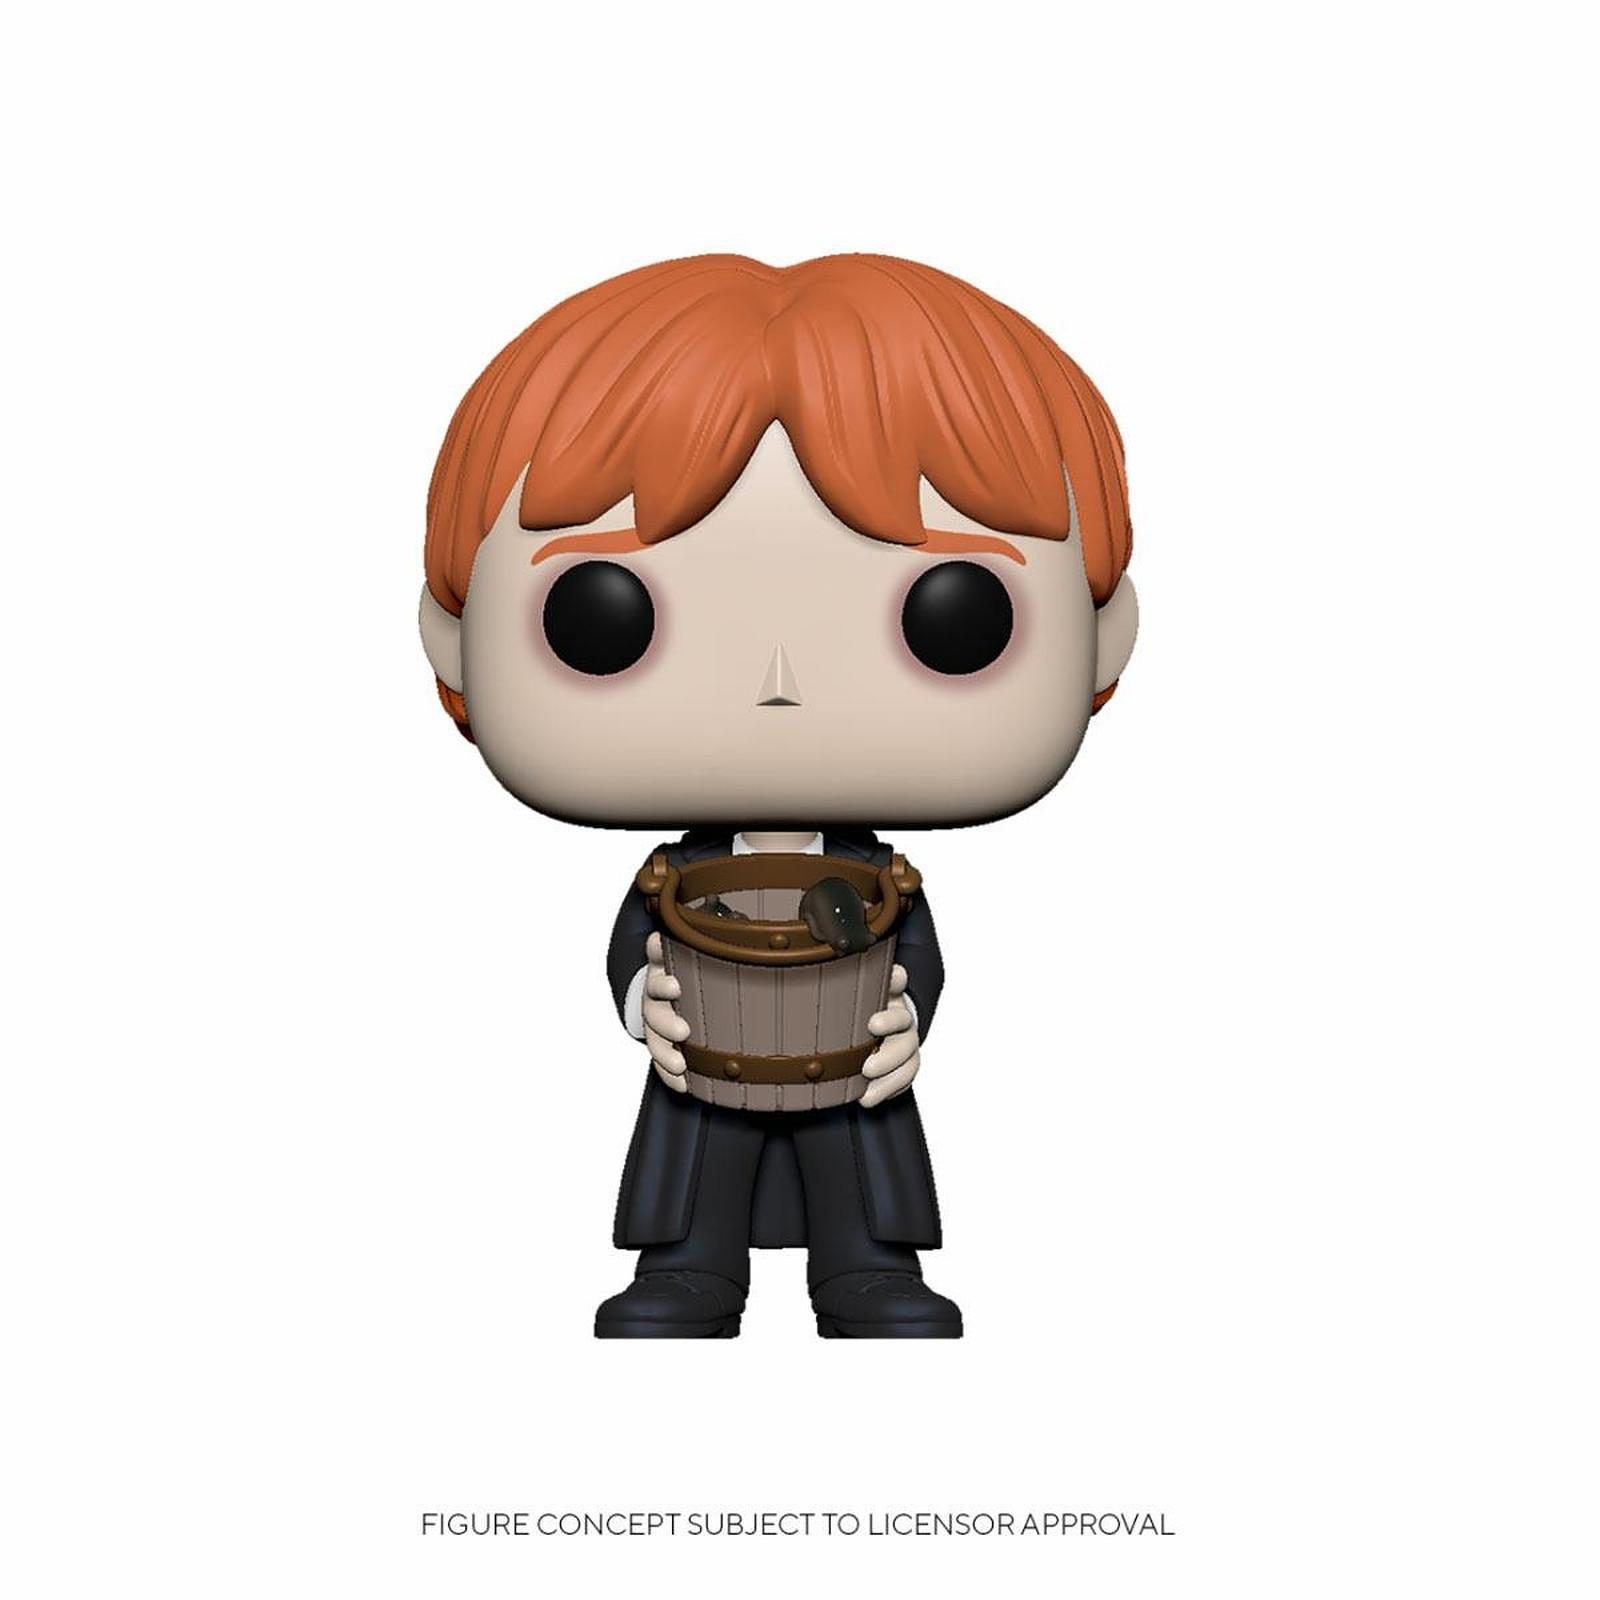 Harry Potter - Figurine POP! Ron Puking Slugs w/Bucket 9 cm